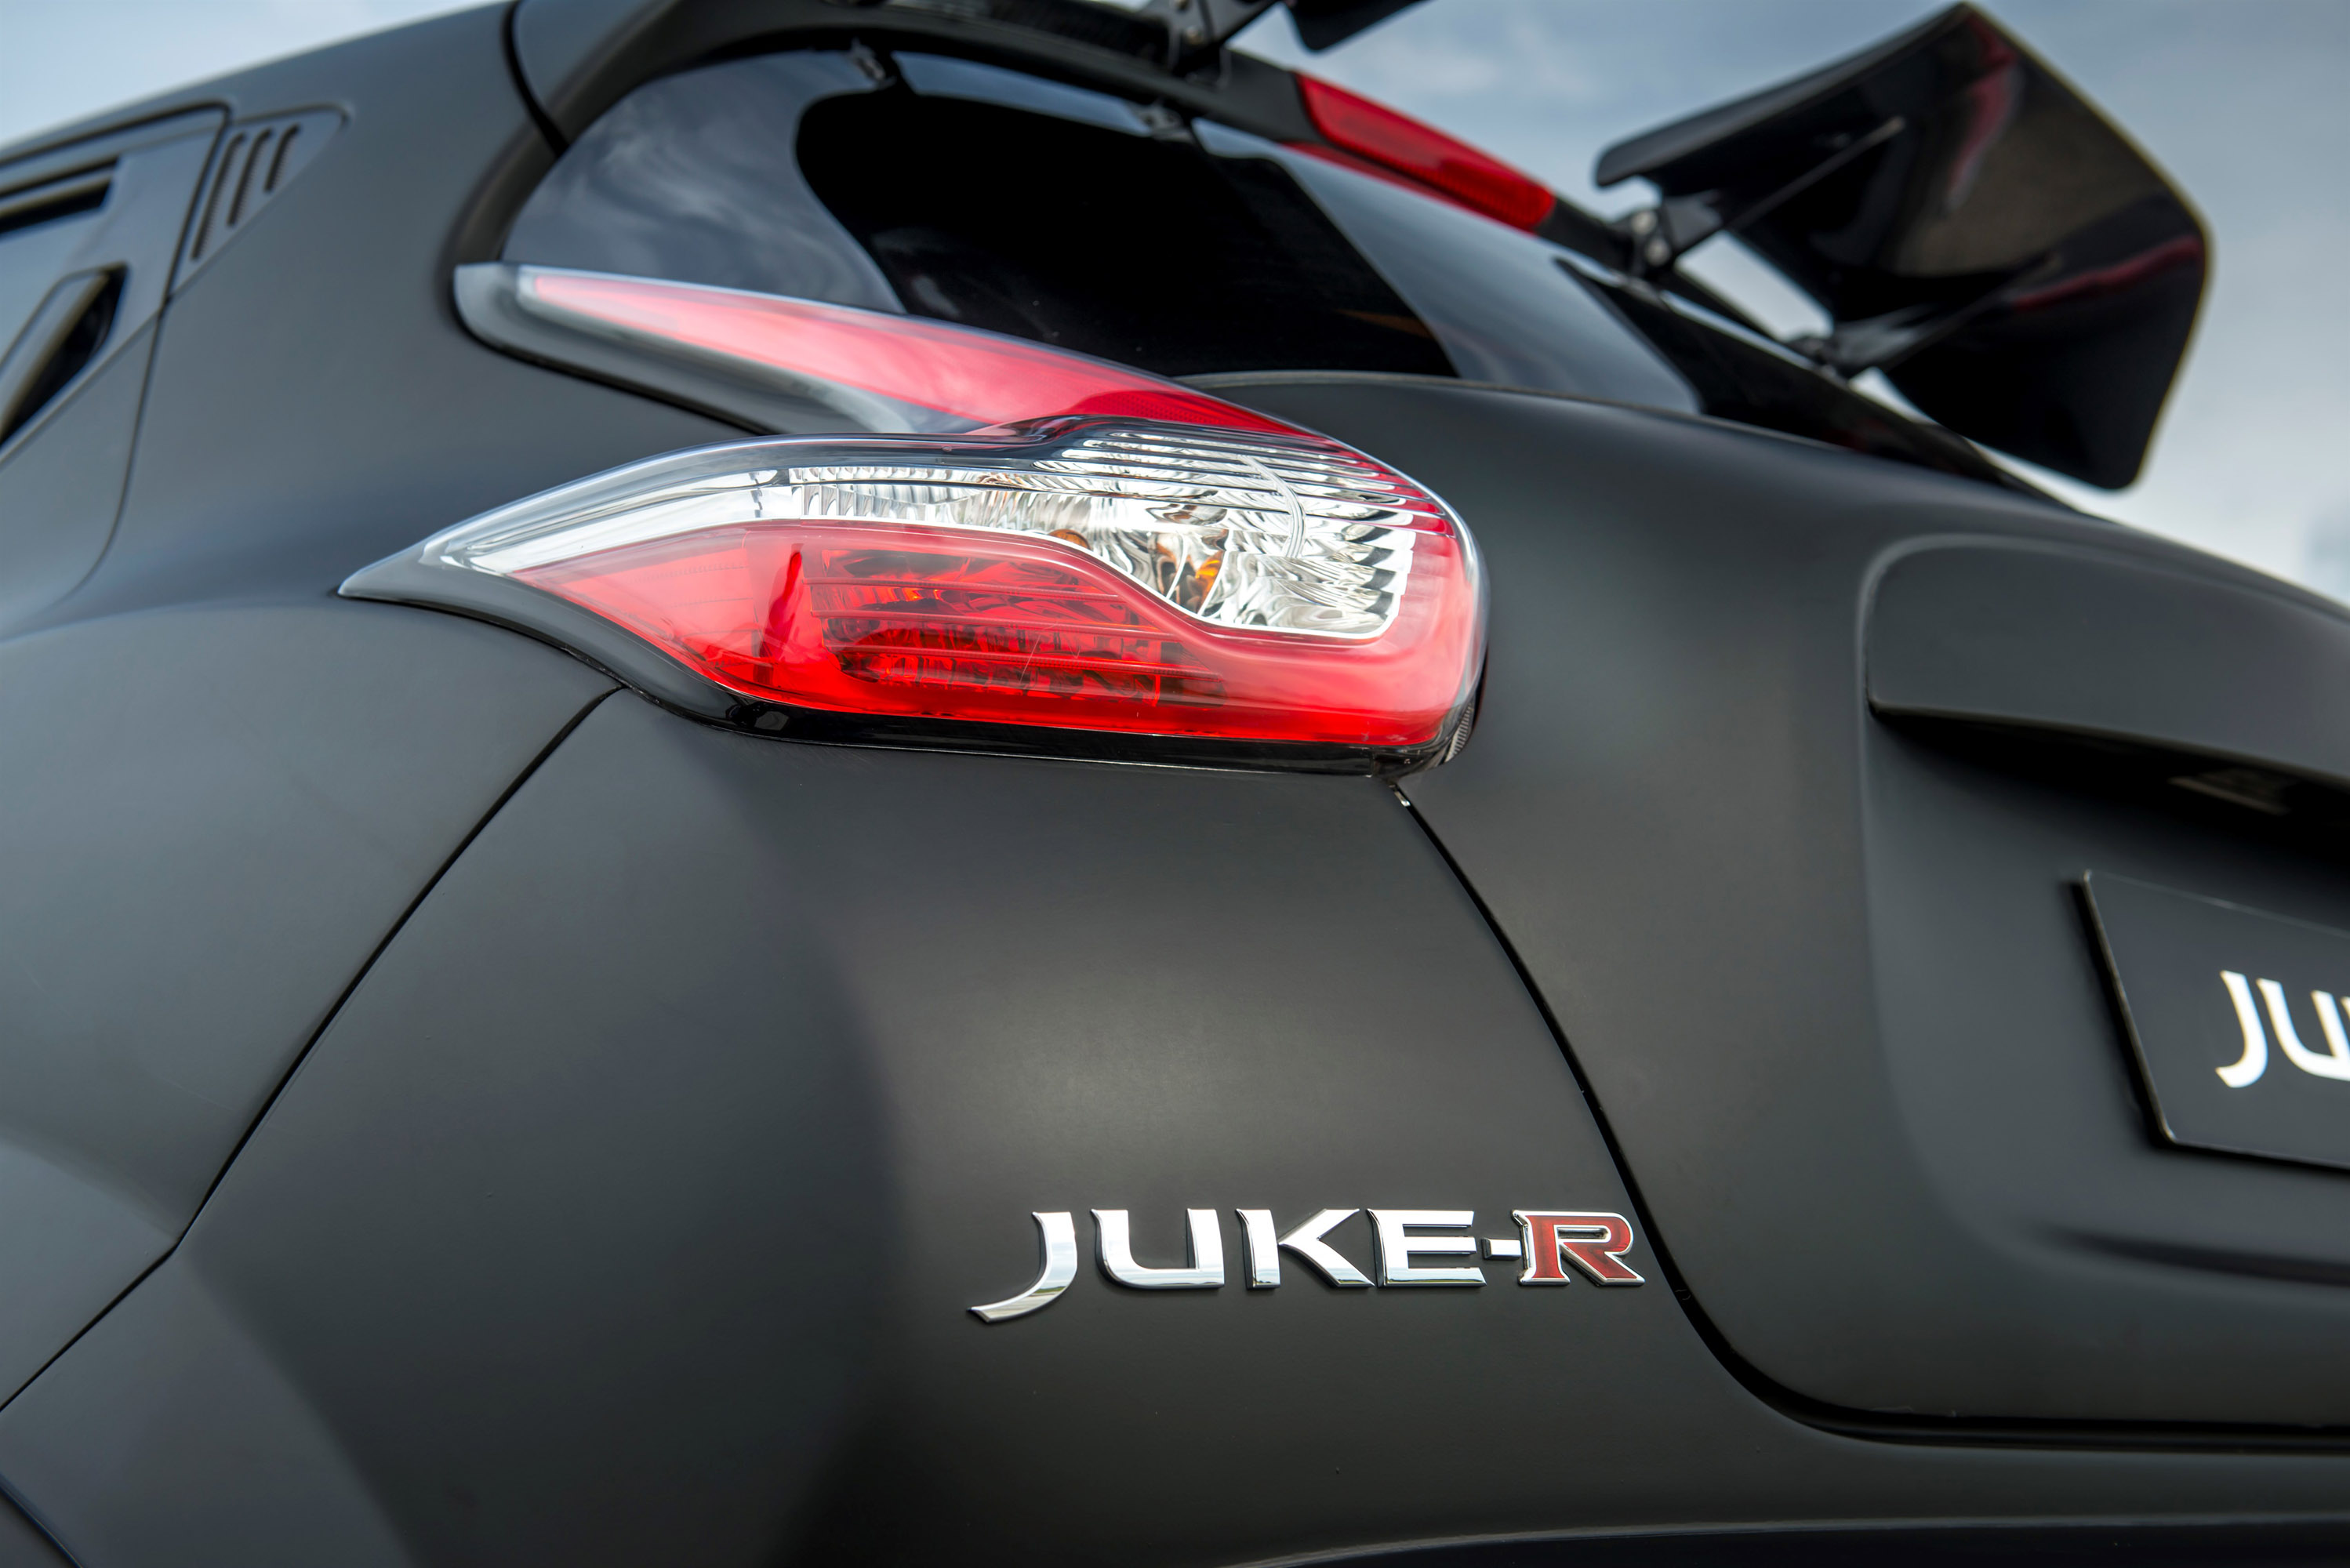 Nissan Juke-R 2.0 Concept photo #21